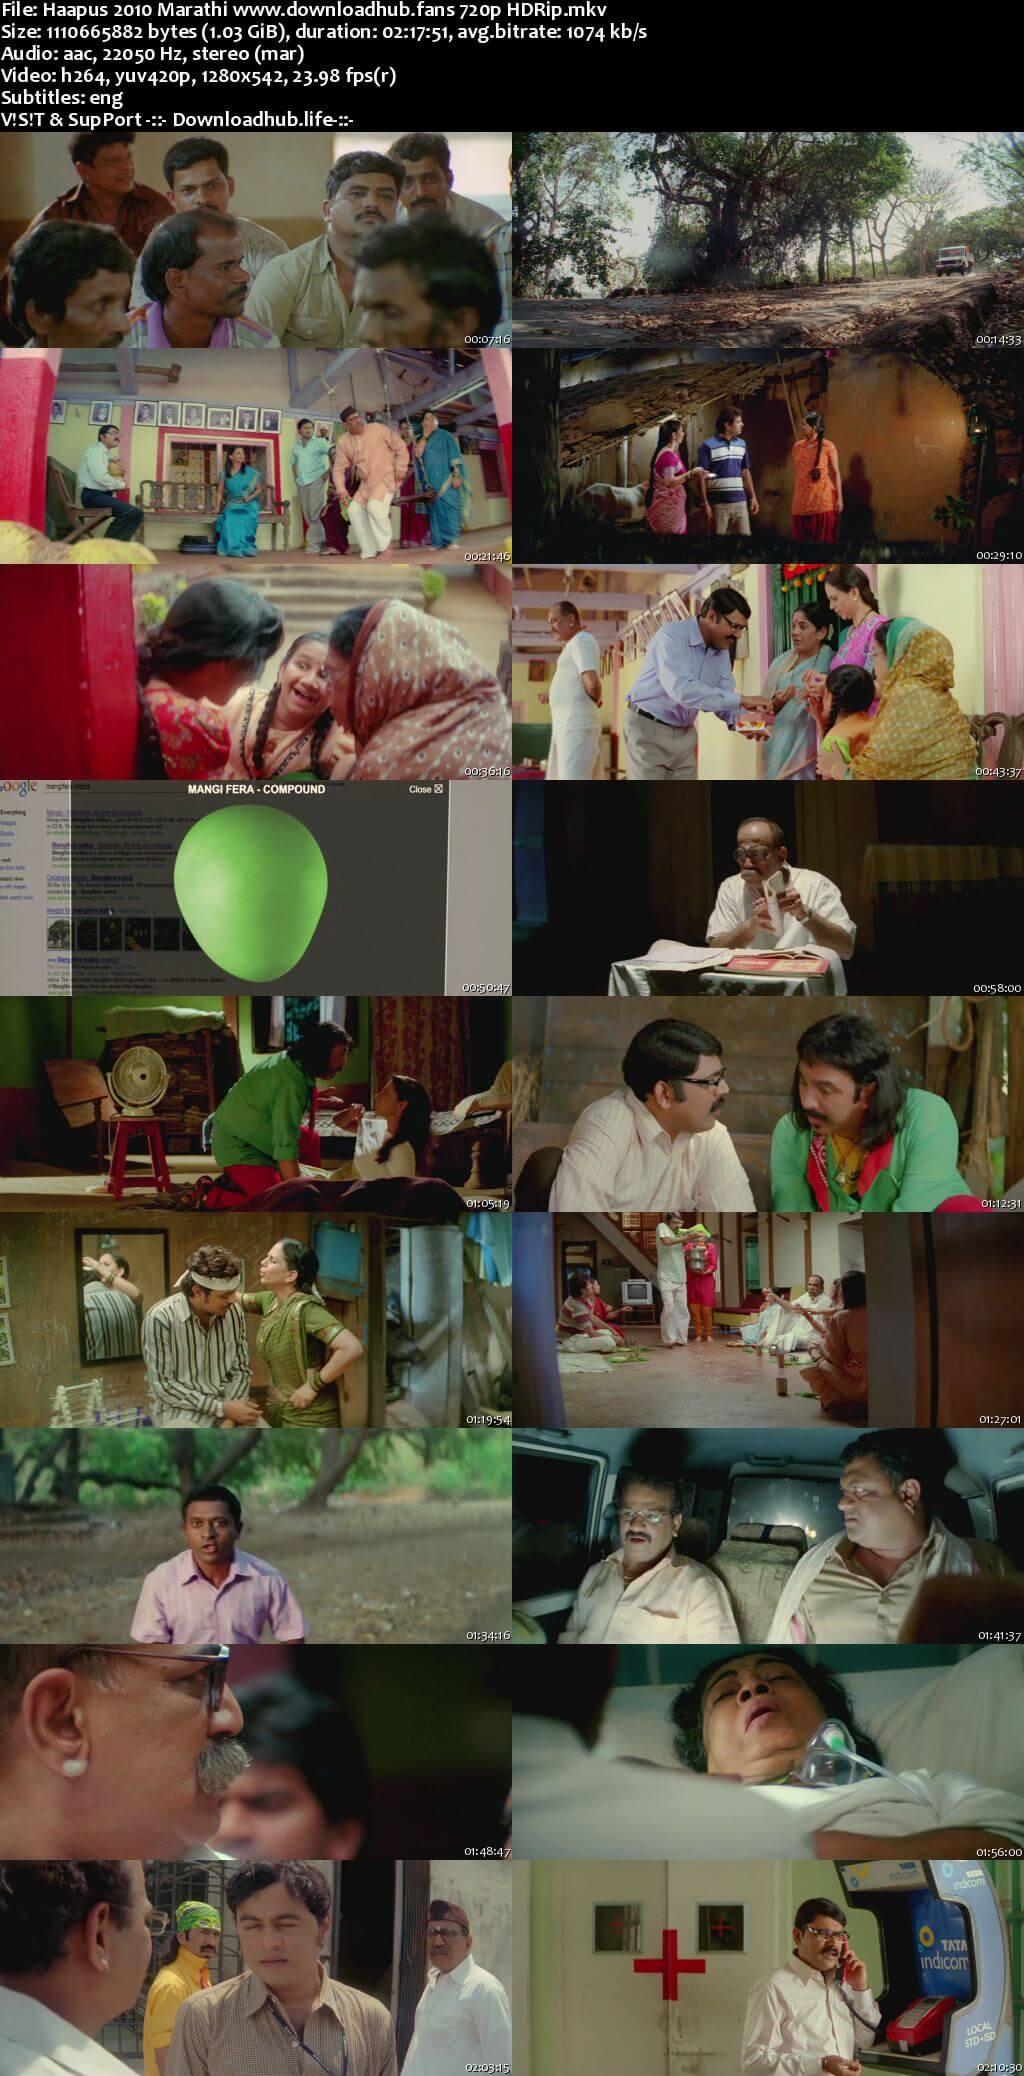 Haapus 2010 Marathi 720p HDRip ESubs